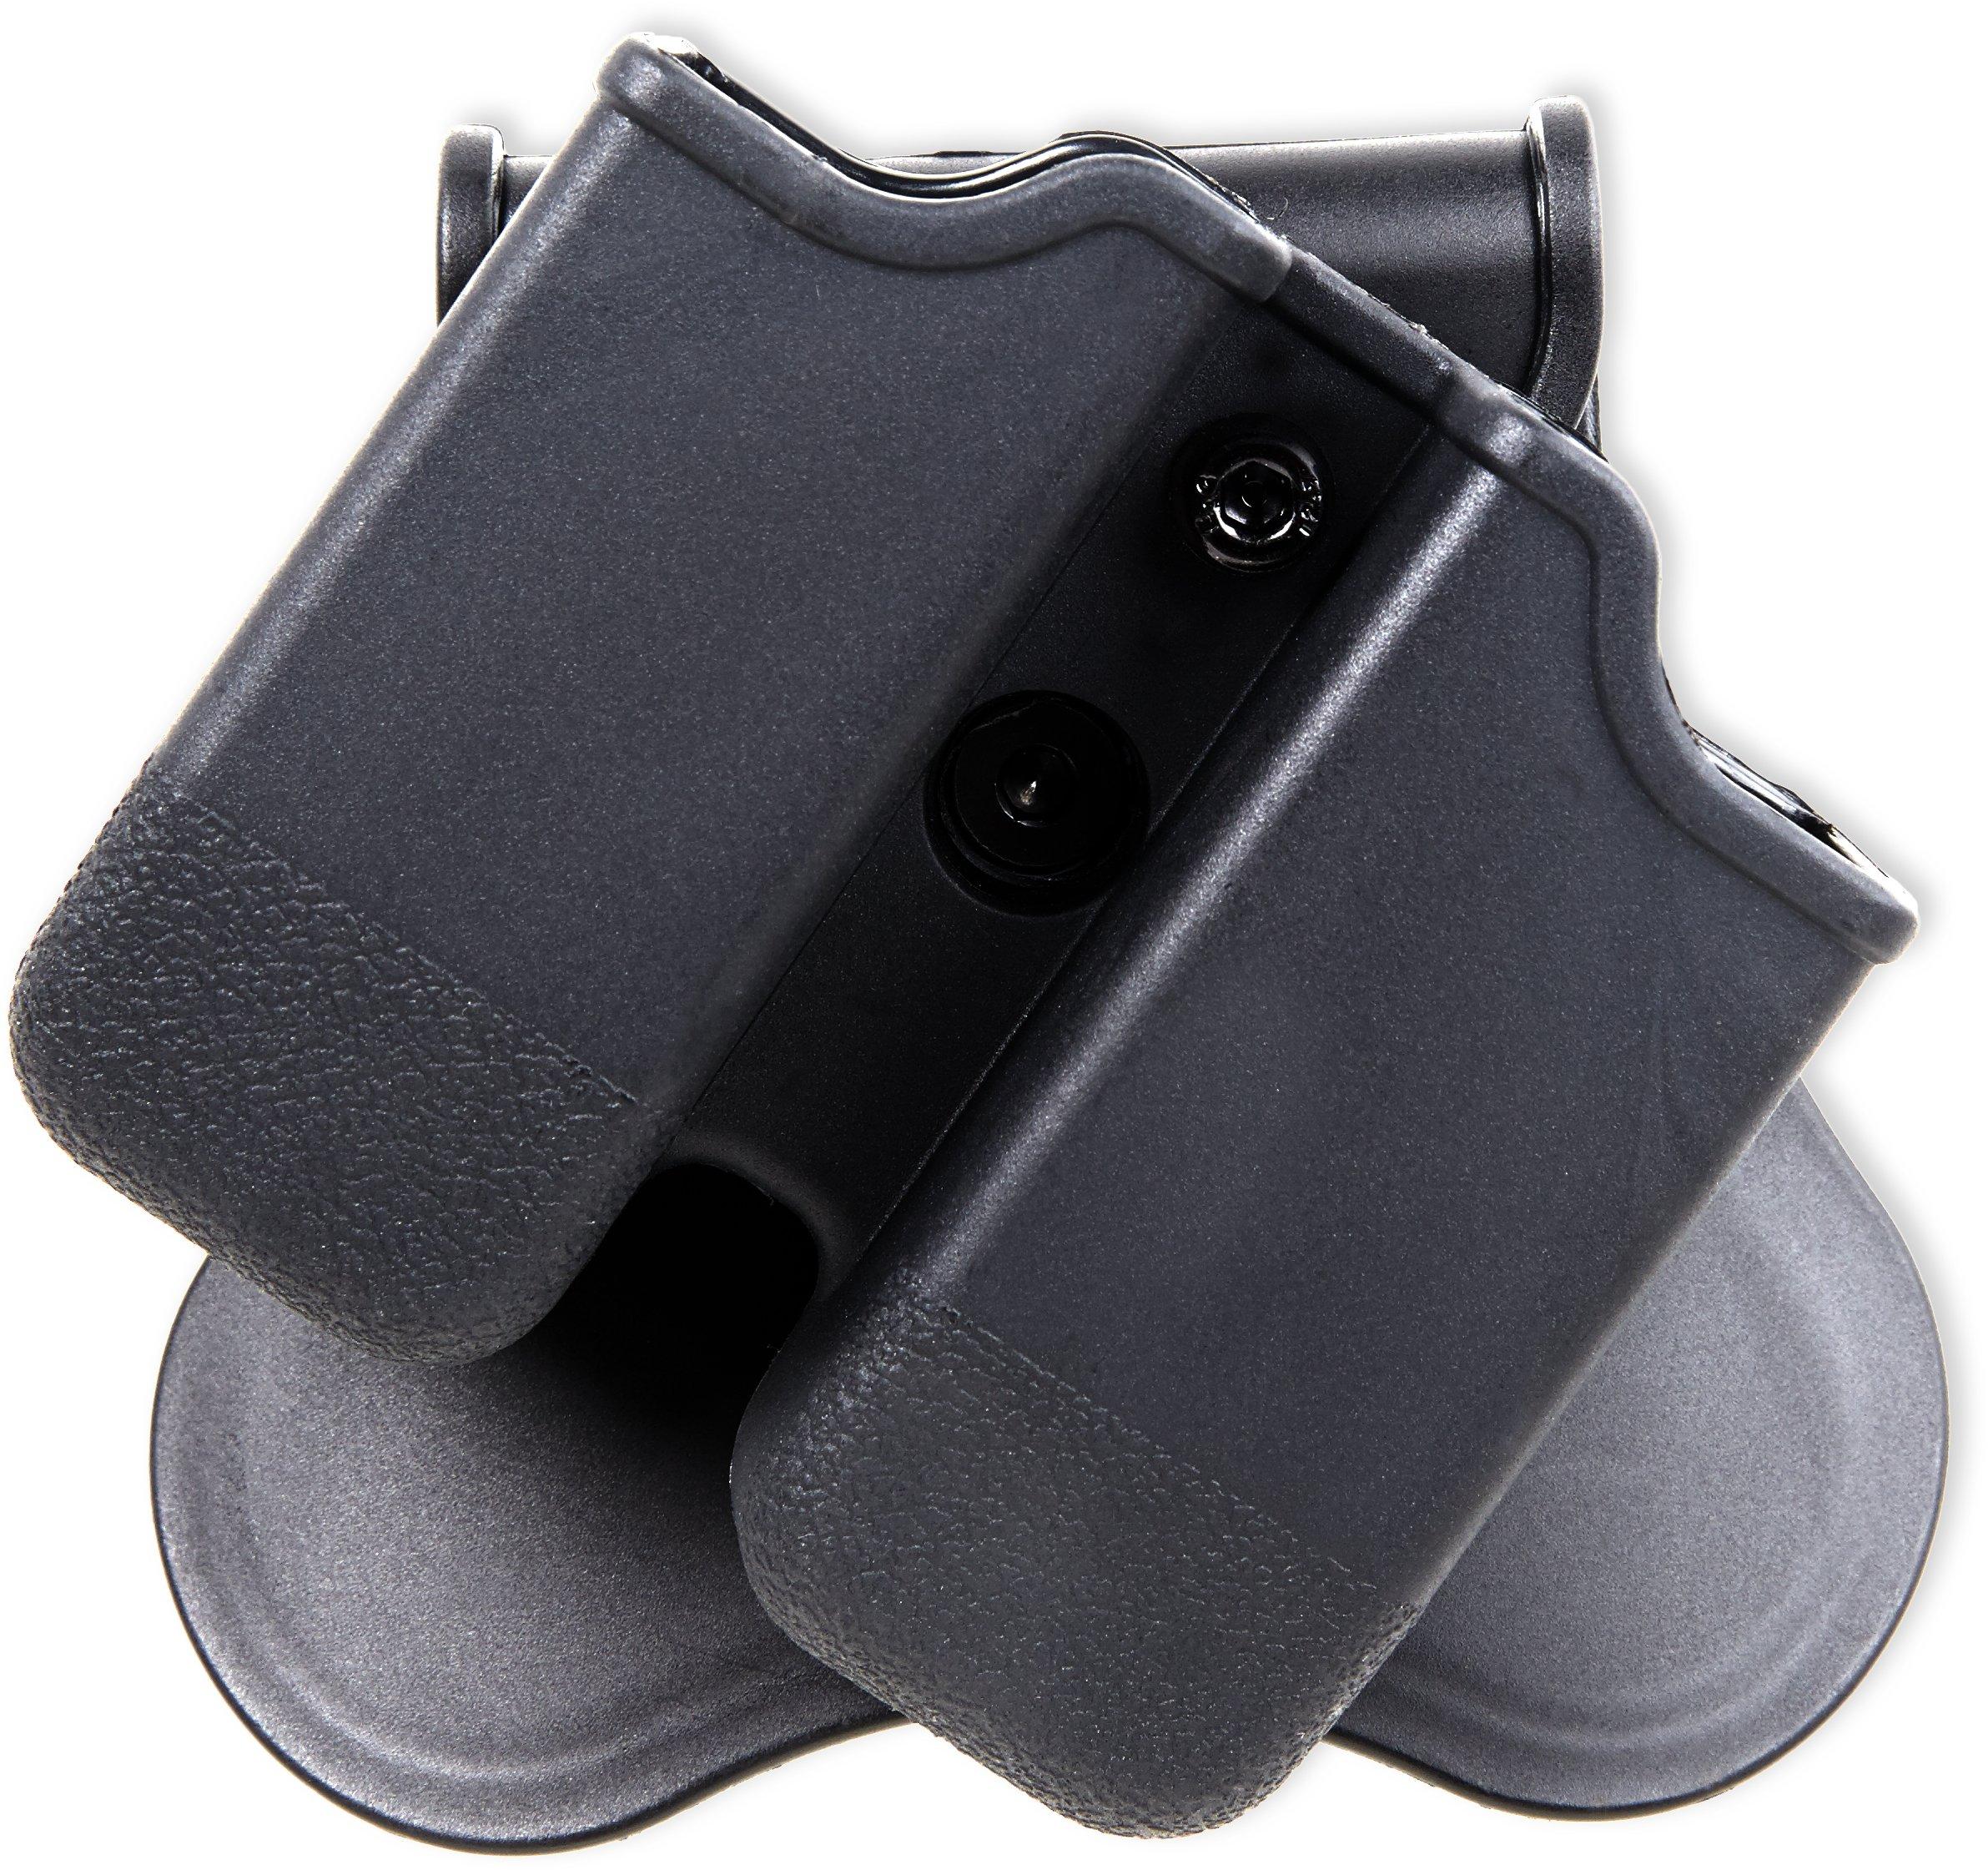 Bulldog Cases P-GM Polymer Magazine Holder, Black, Left/Right by Bulldog Cases (Image #2)